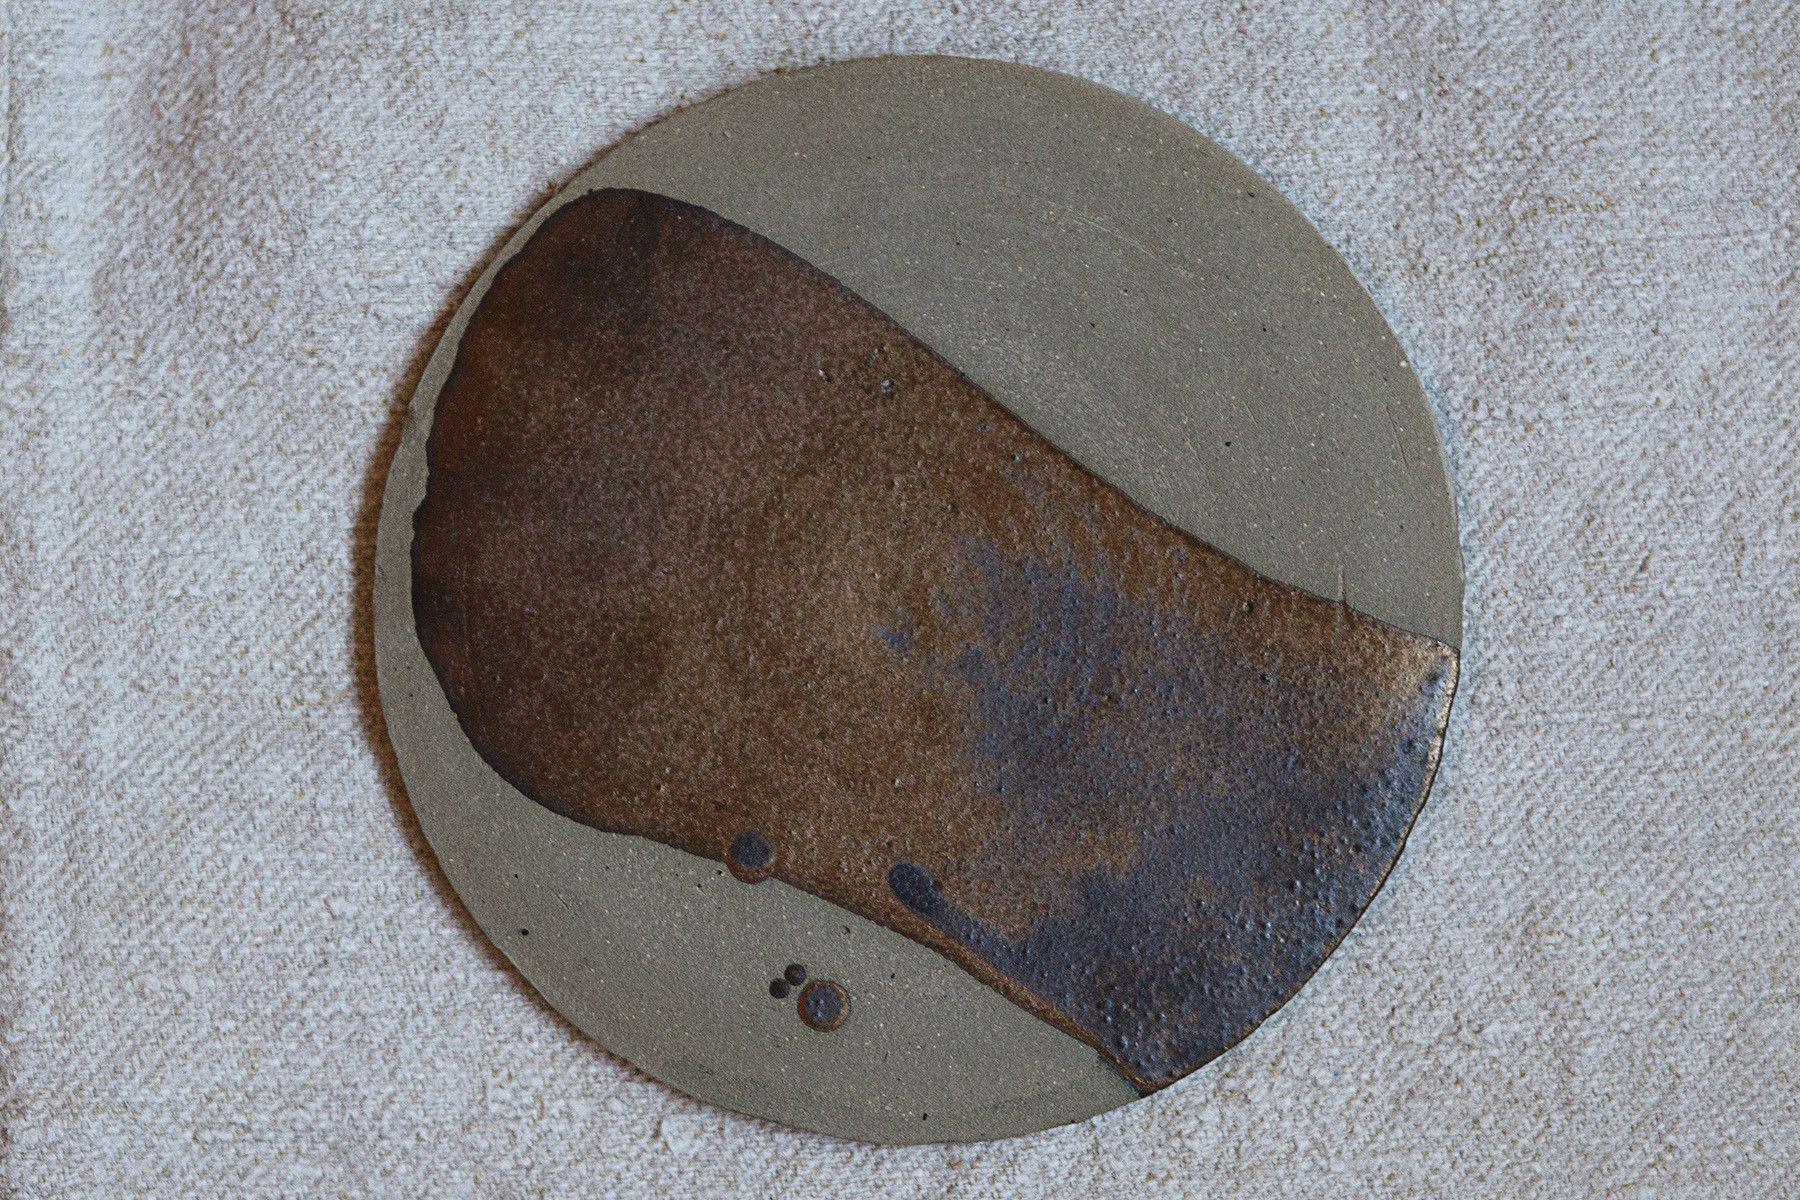 Janaki Larsen Circular Cheese Plate with Metallic Glaze